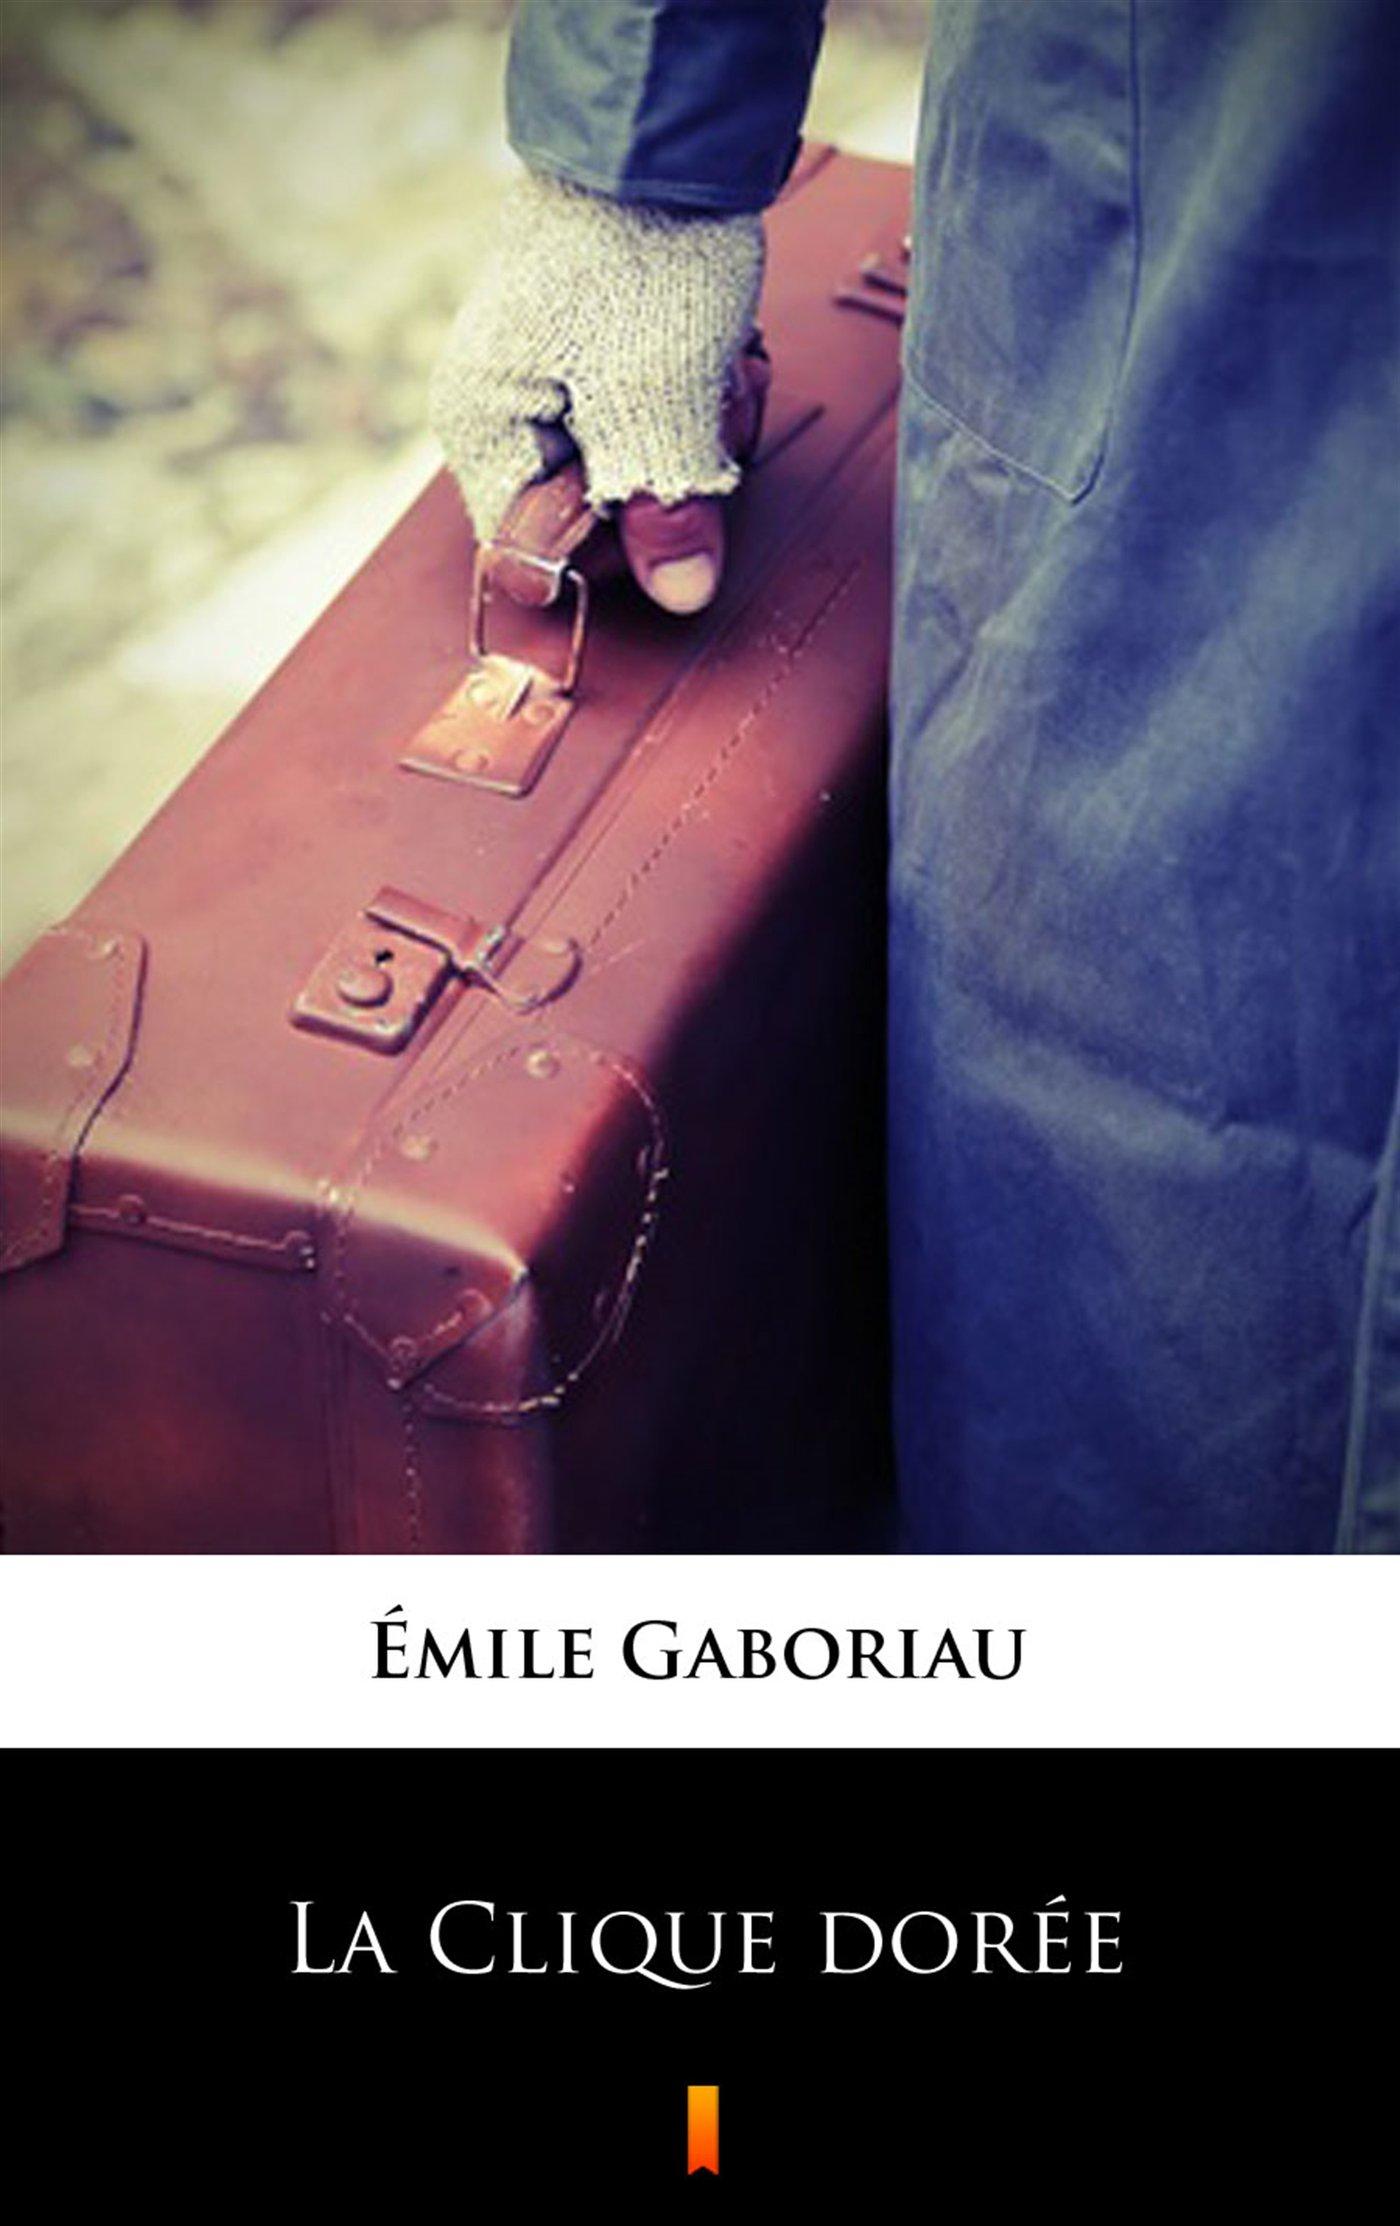 La Clique dorée - Ebook (Książka EPUB) do pobrania w formacie EPUB